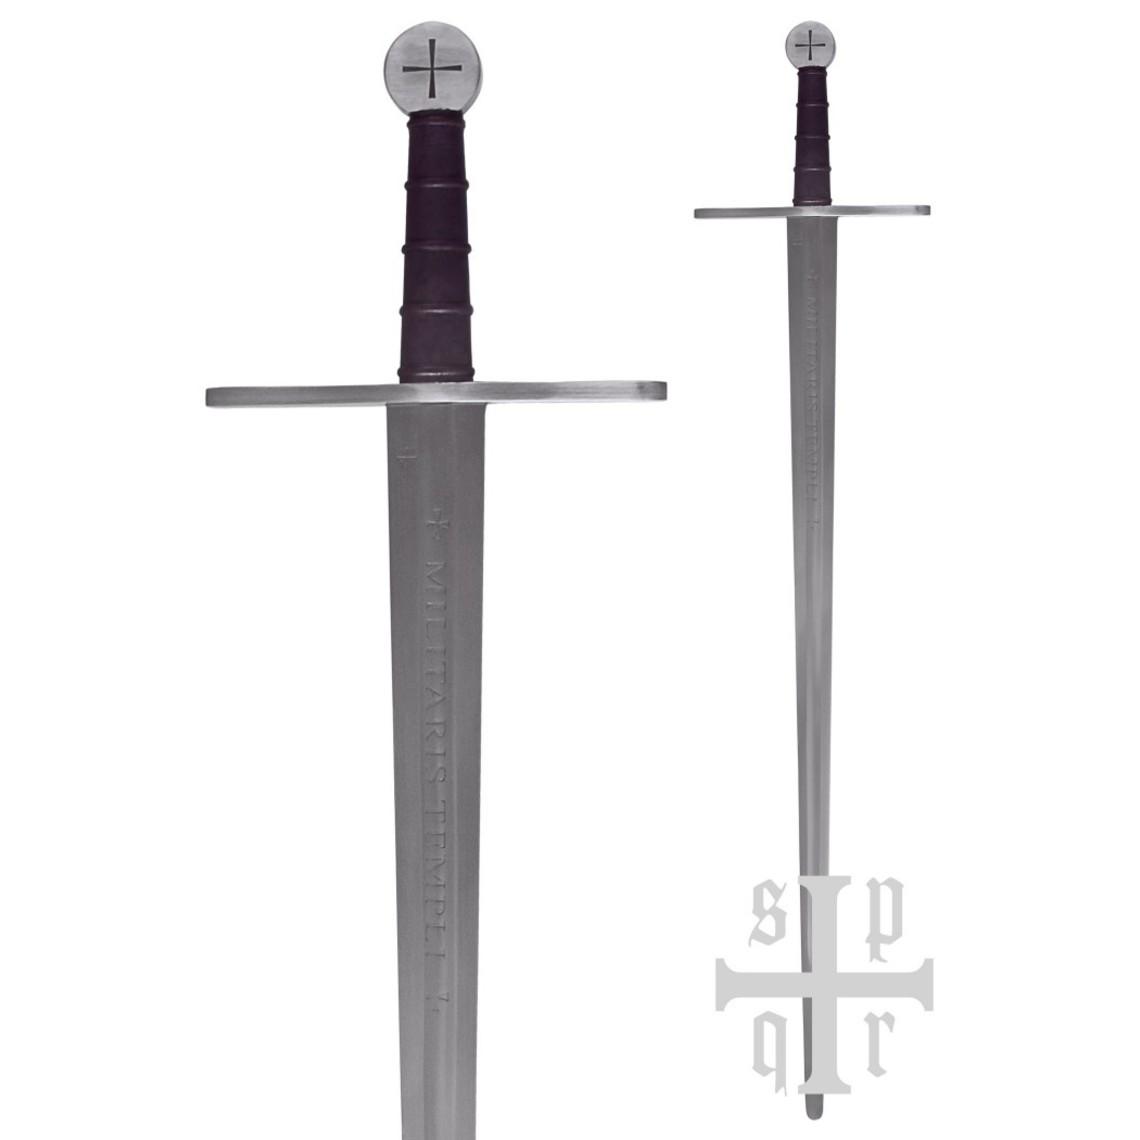 SPQR Spada Templare Milites Templi, pronto per la battaglia